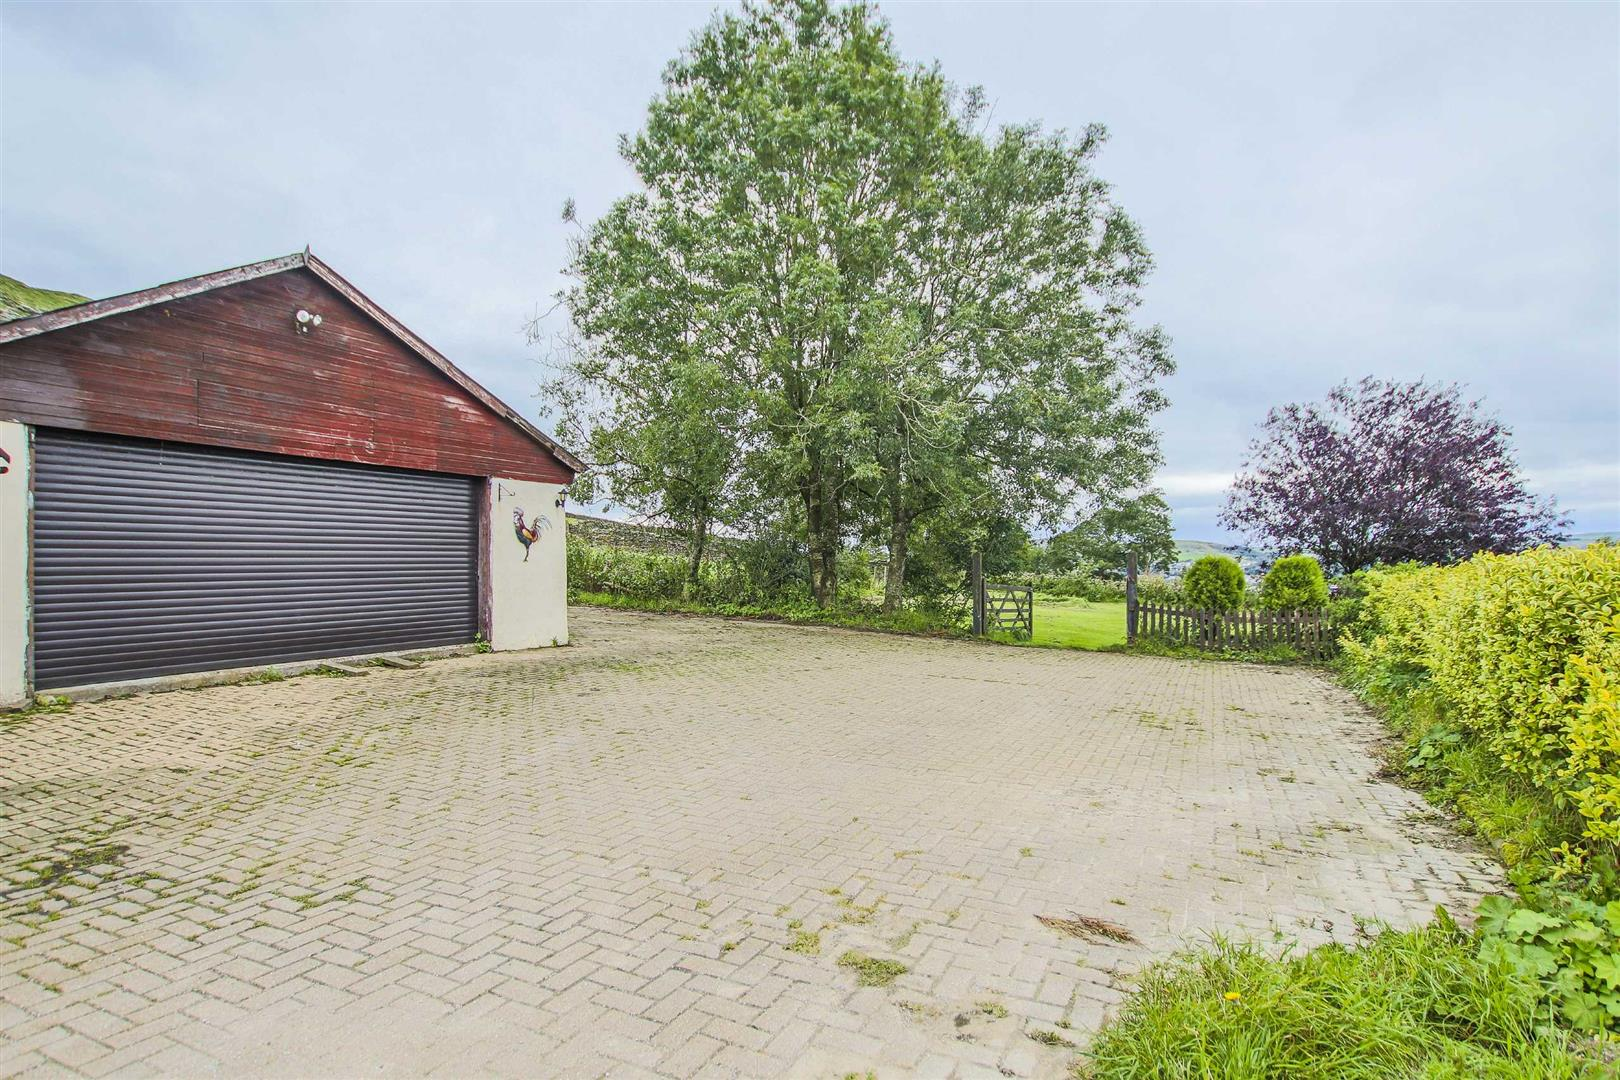 4 Bedroom Semi-detached House For Sale - Image 4